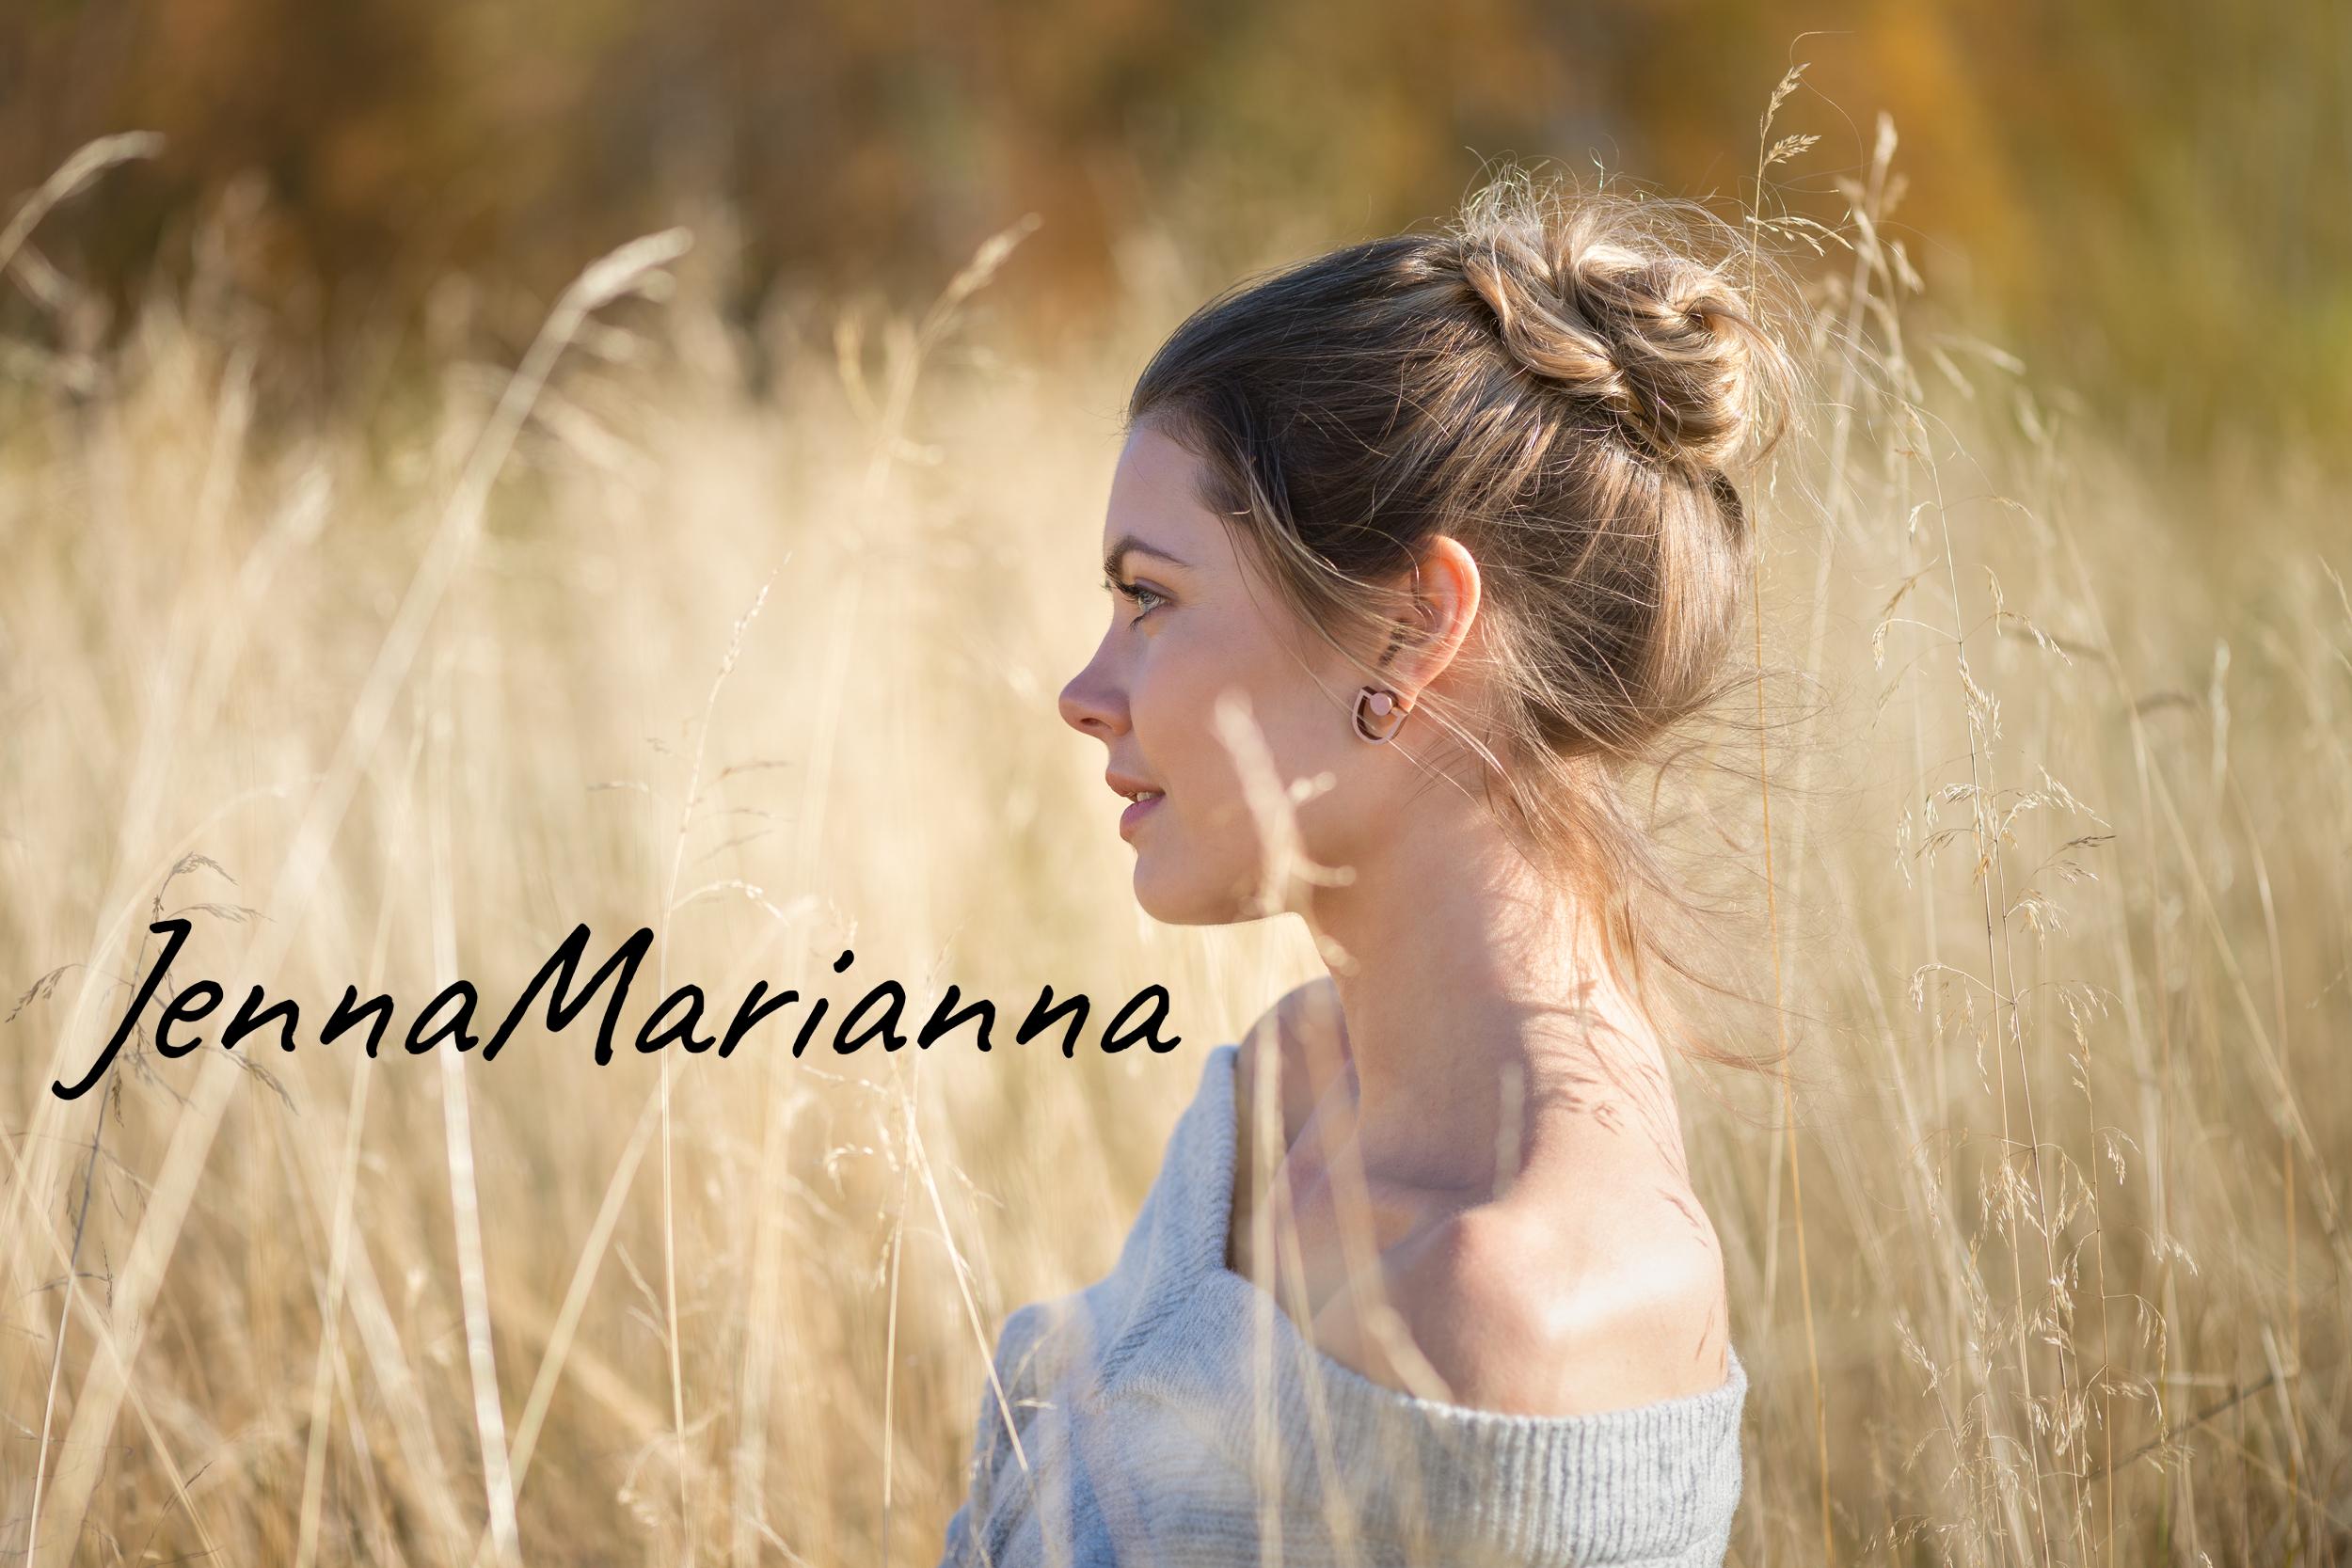 JennaMarianna